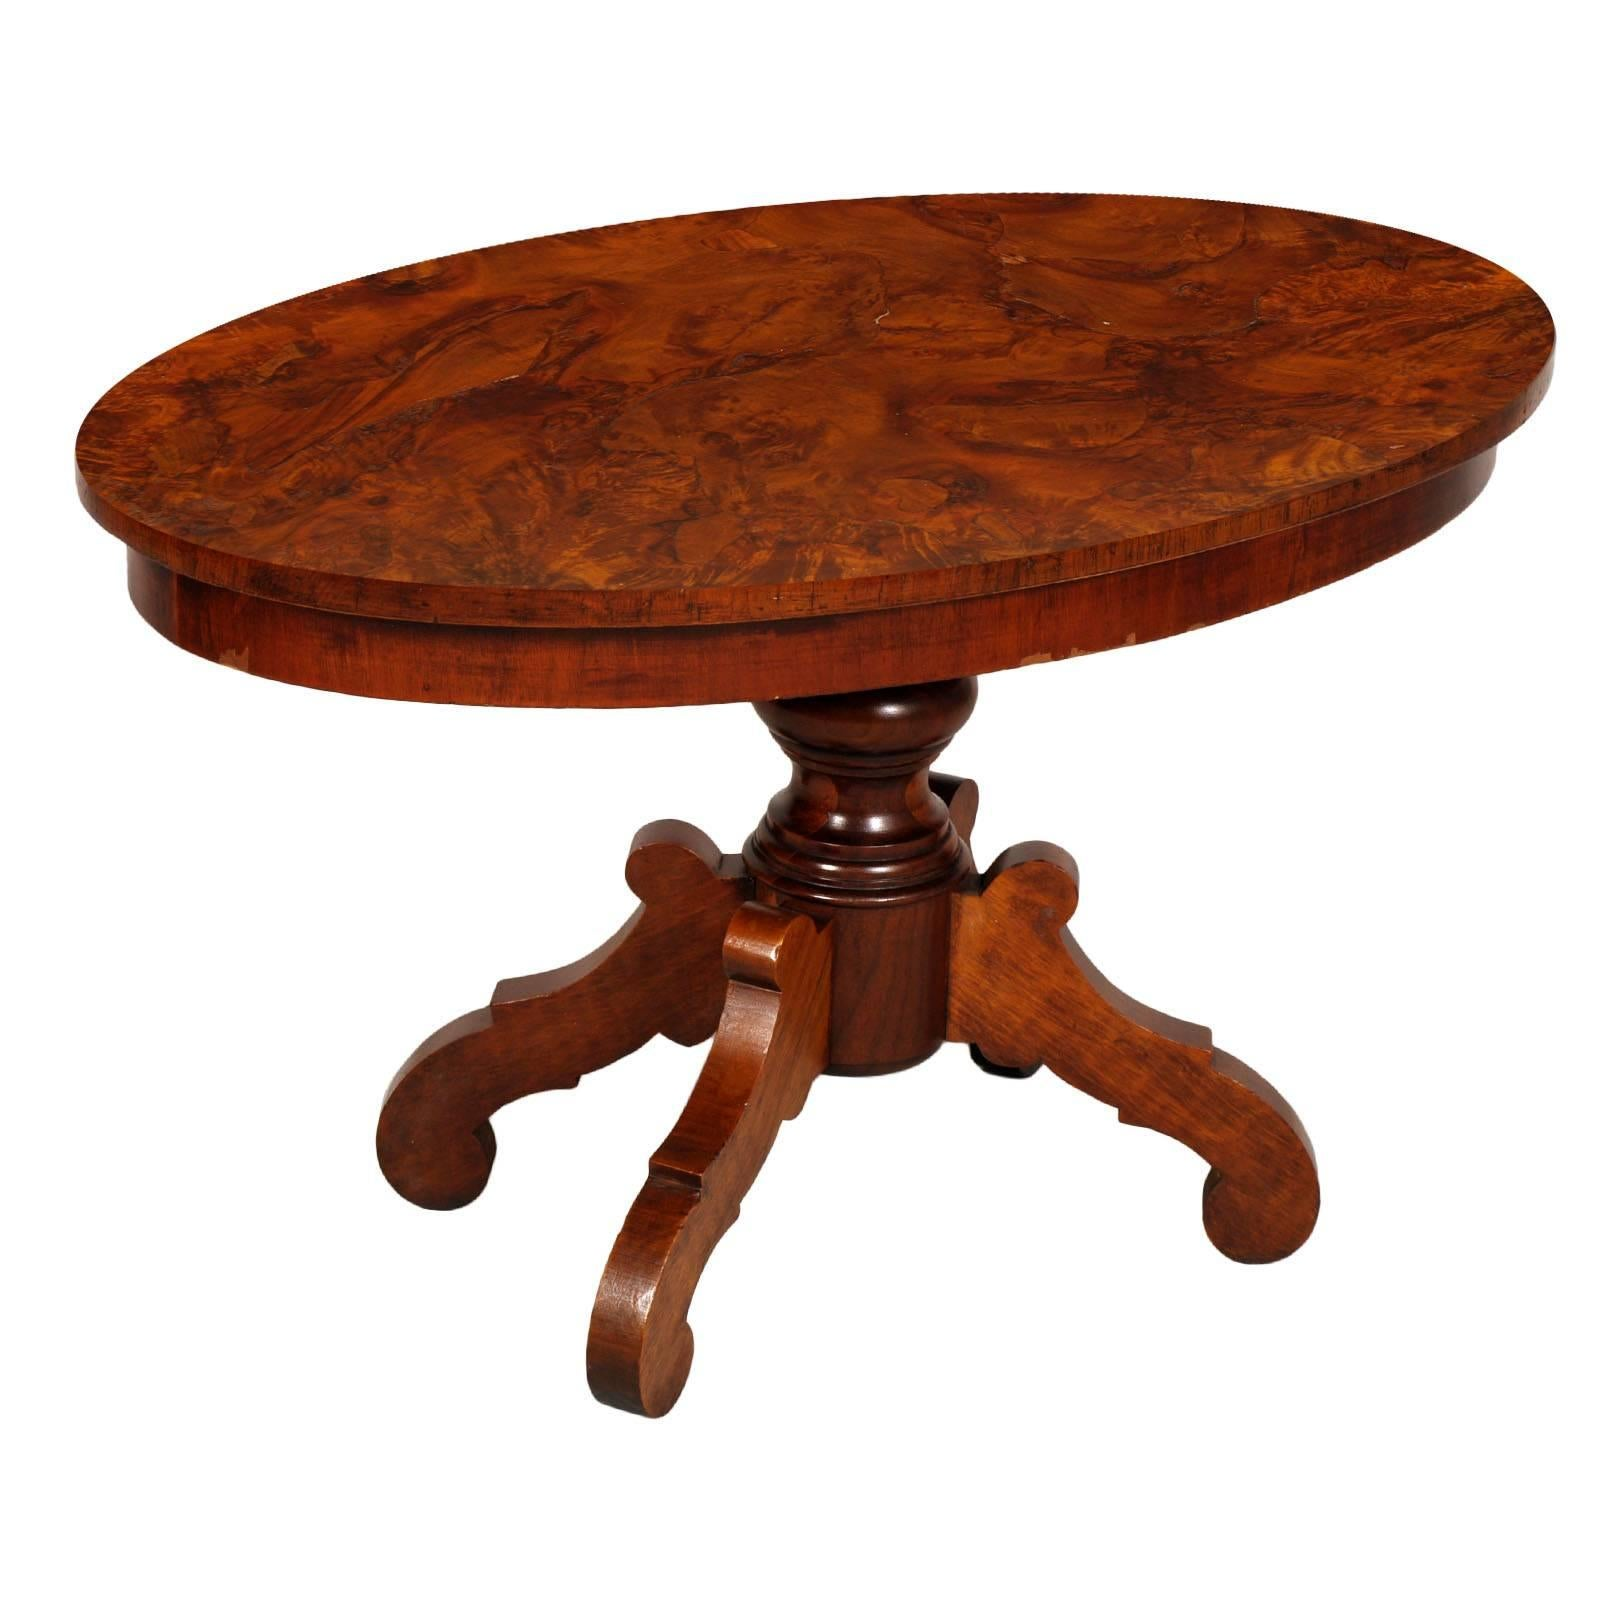 Era Art Deco Coffee Center Table, in Walnut, Burl Walnut the Top, Wax-Polished